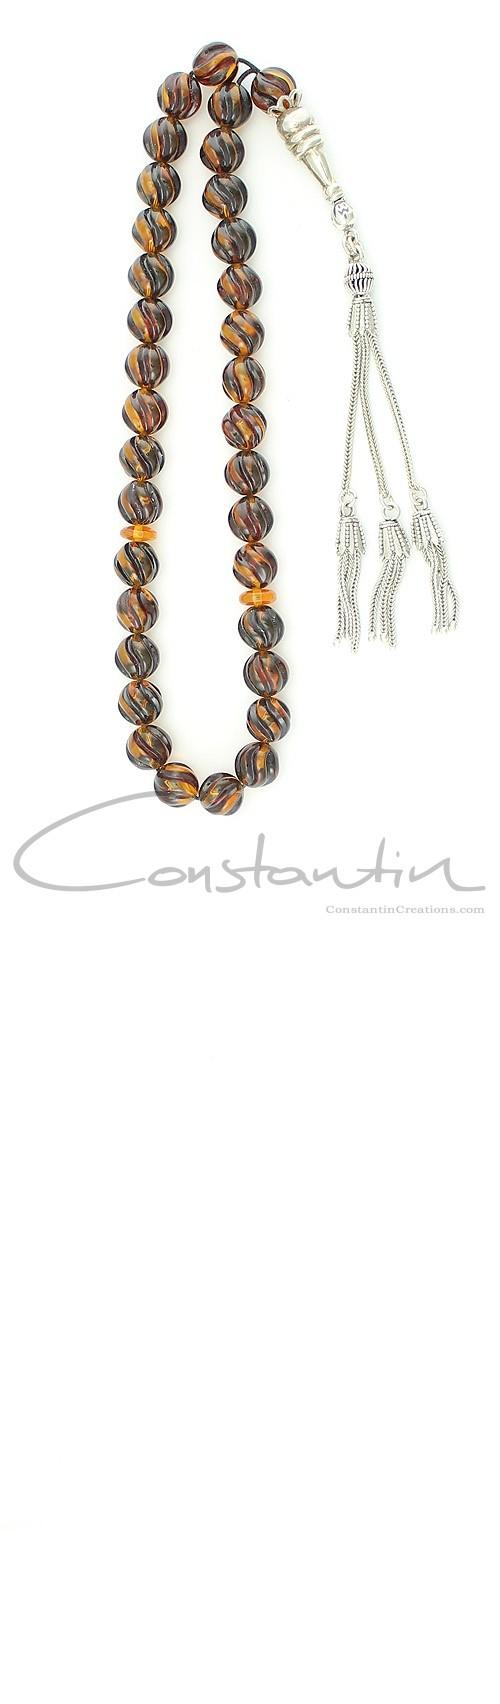 Constantin Creations- komboloi-multicolor-natural-amber-worry-beads-komboloi-kehribar-tesbih-greek-komboloi-مسبحة-كهرمان-العنبر-المسبحة-M273